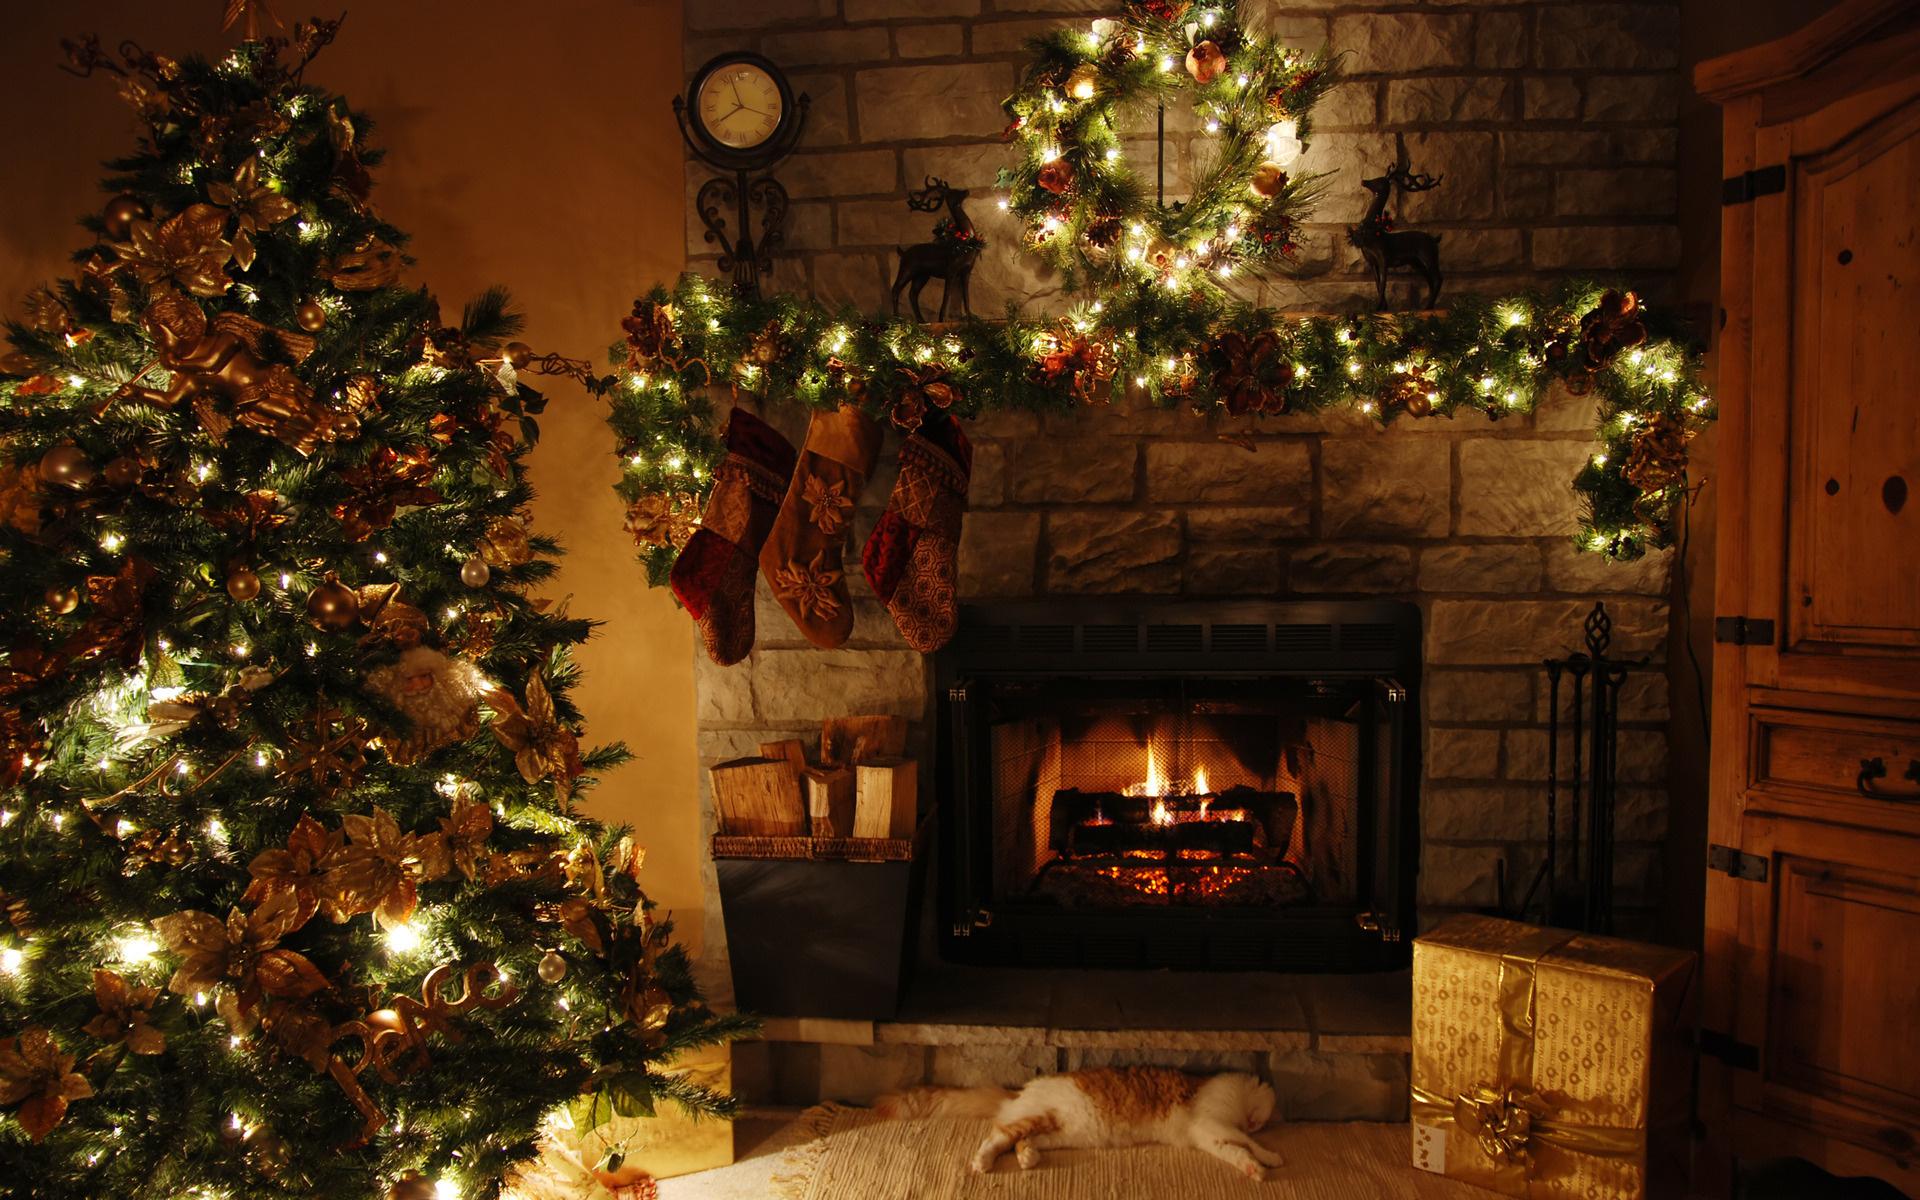 61] Christmas Fireplace Wallpaper on WallpaperSafari 1920x1200